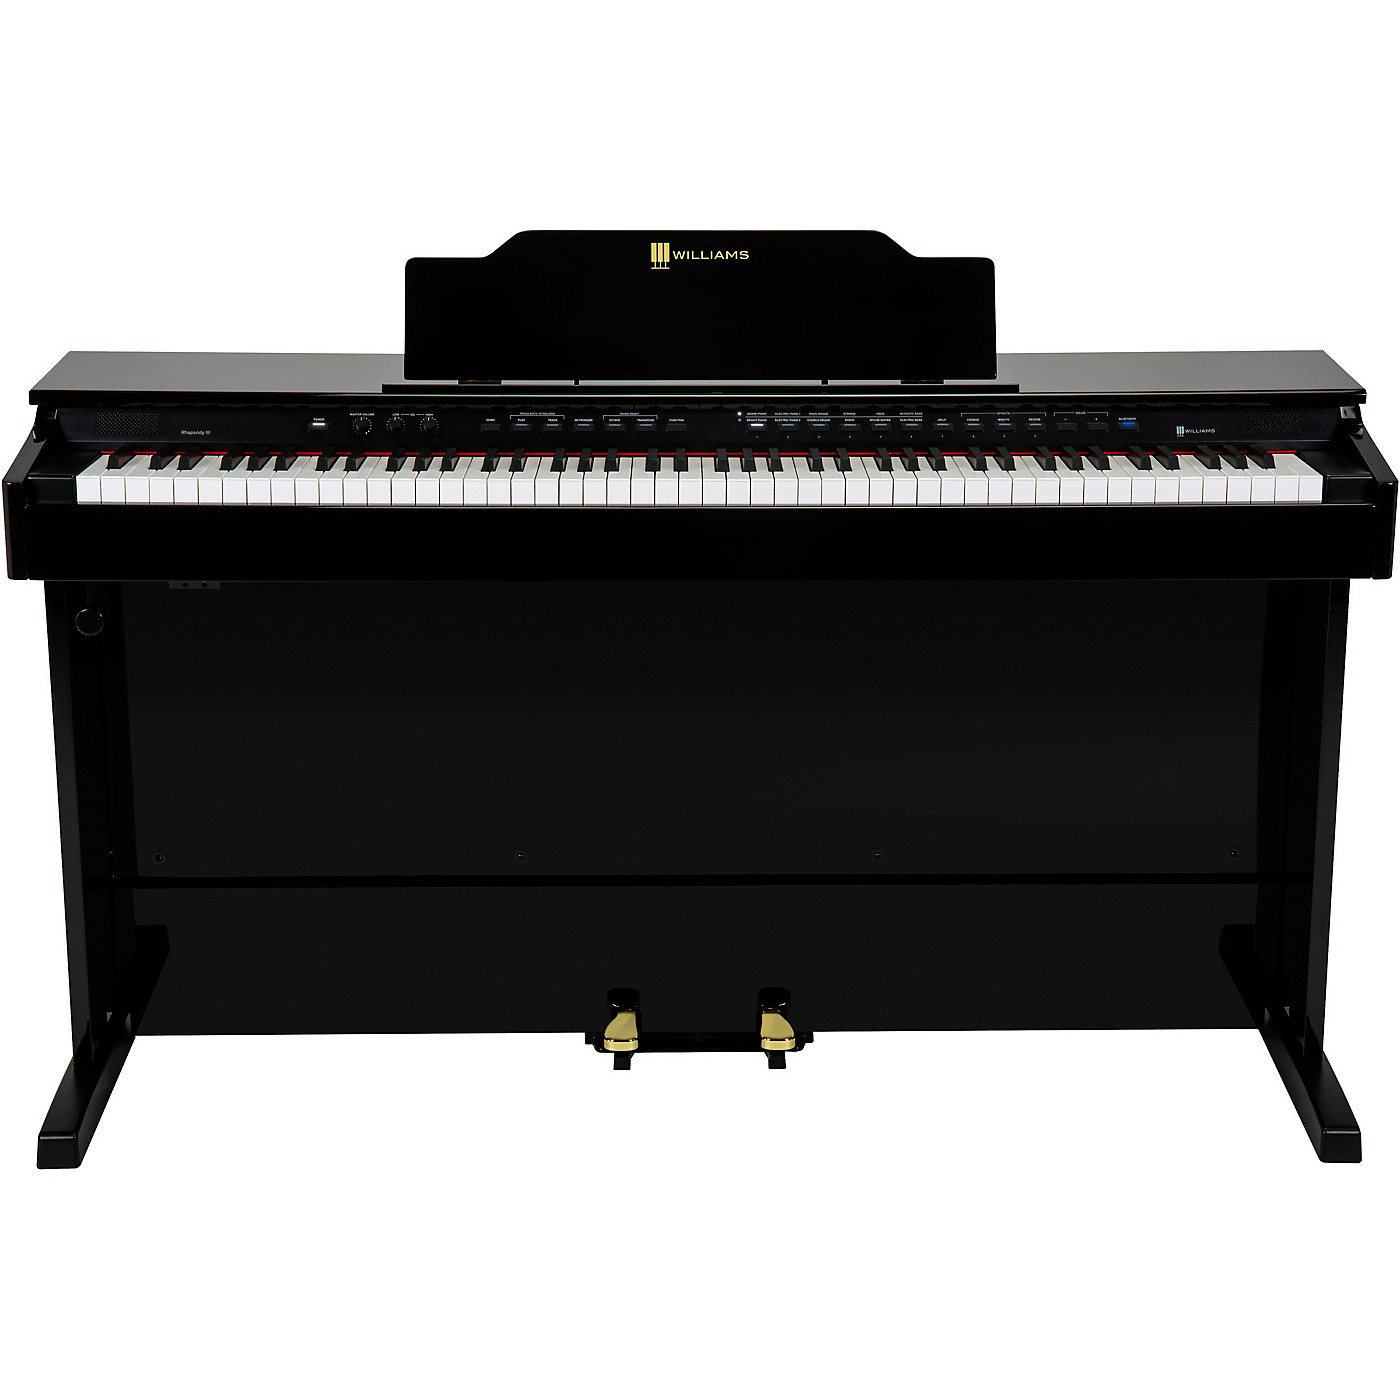 Williams Rhapsody III Digital Piano with Bluetooth thumbnail